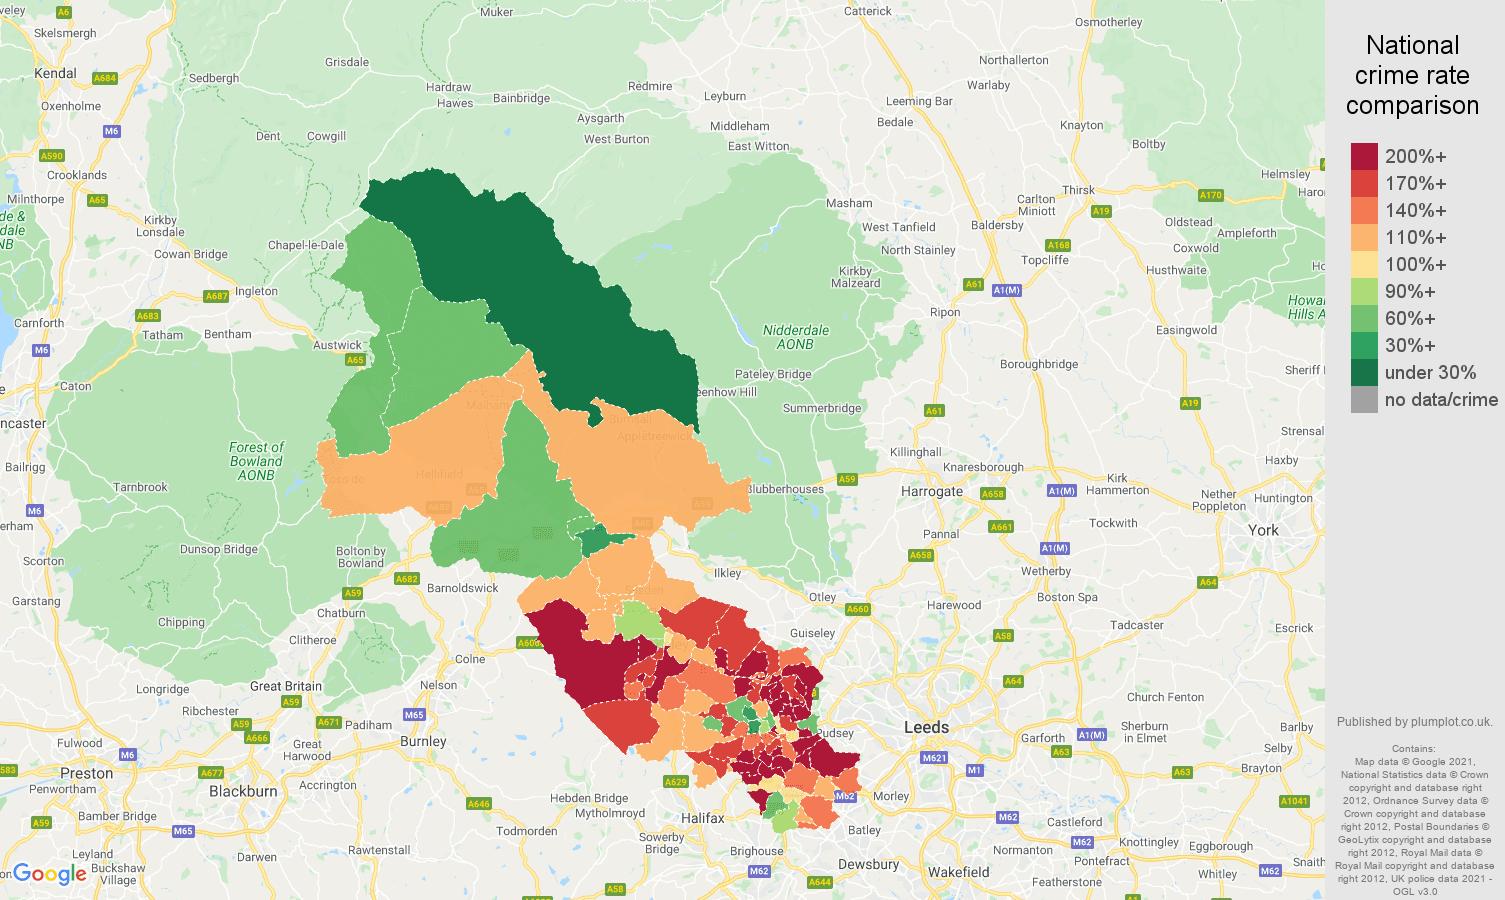 Bradford burglary crime rate comparison map